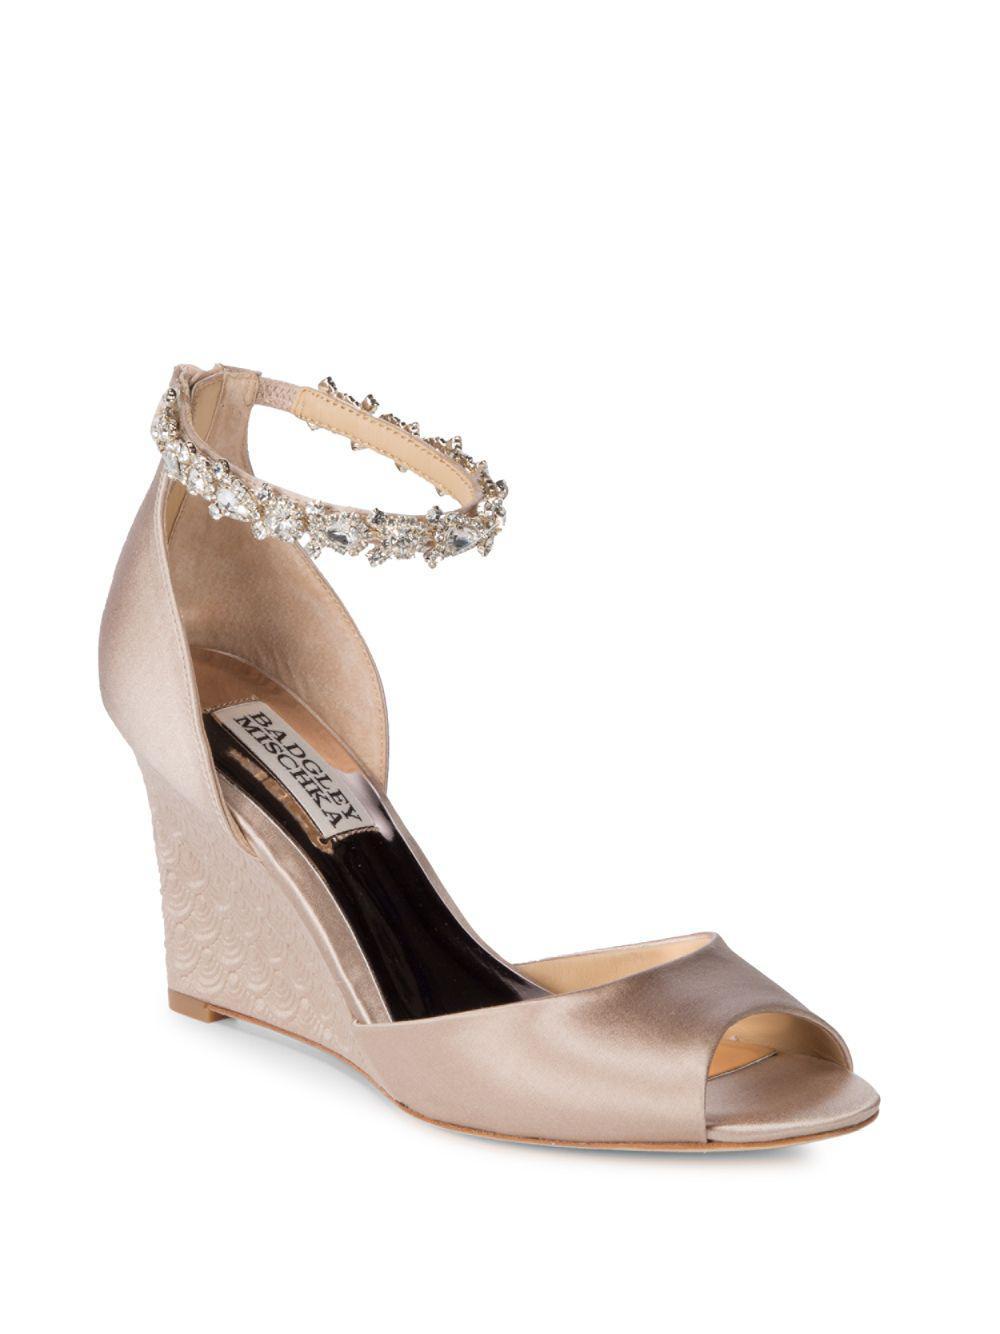 Badgley Mischka Paula Bejeweled Satin Slingback Sandals KQI81r